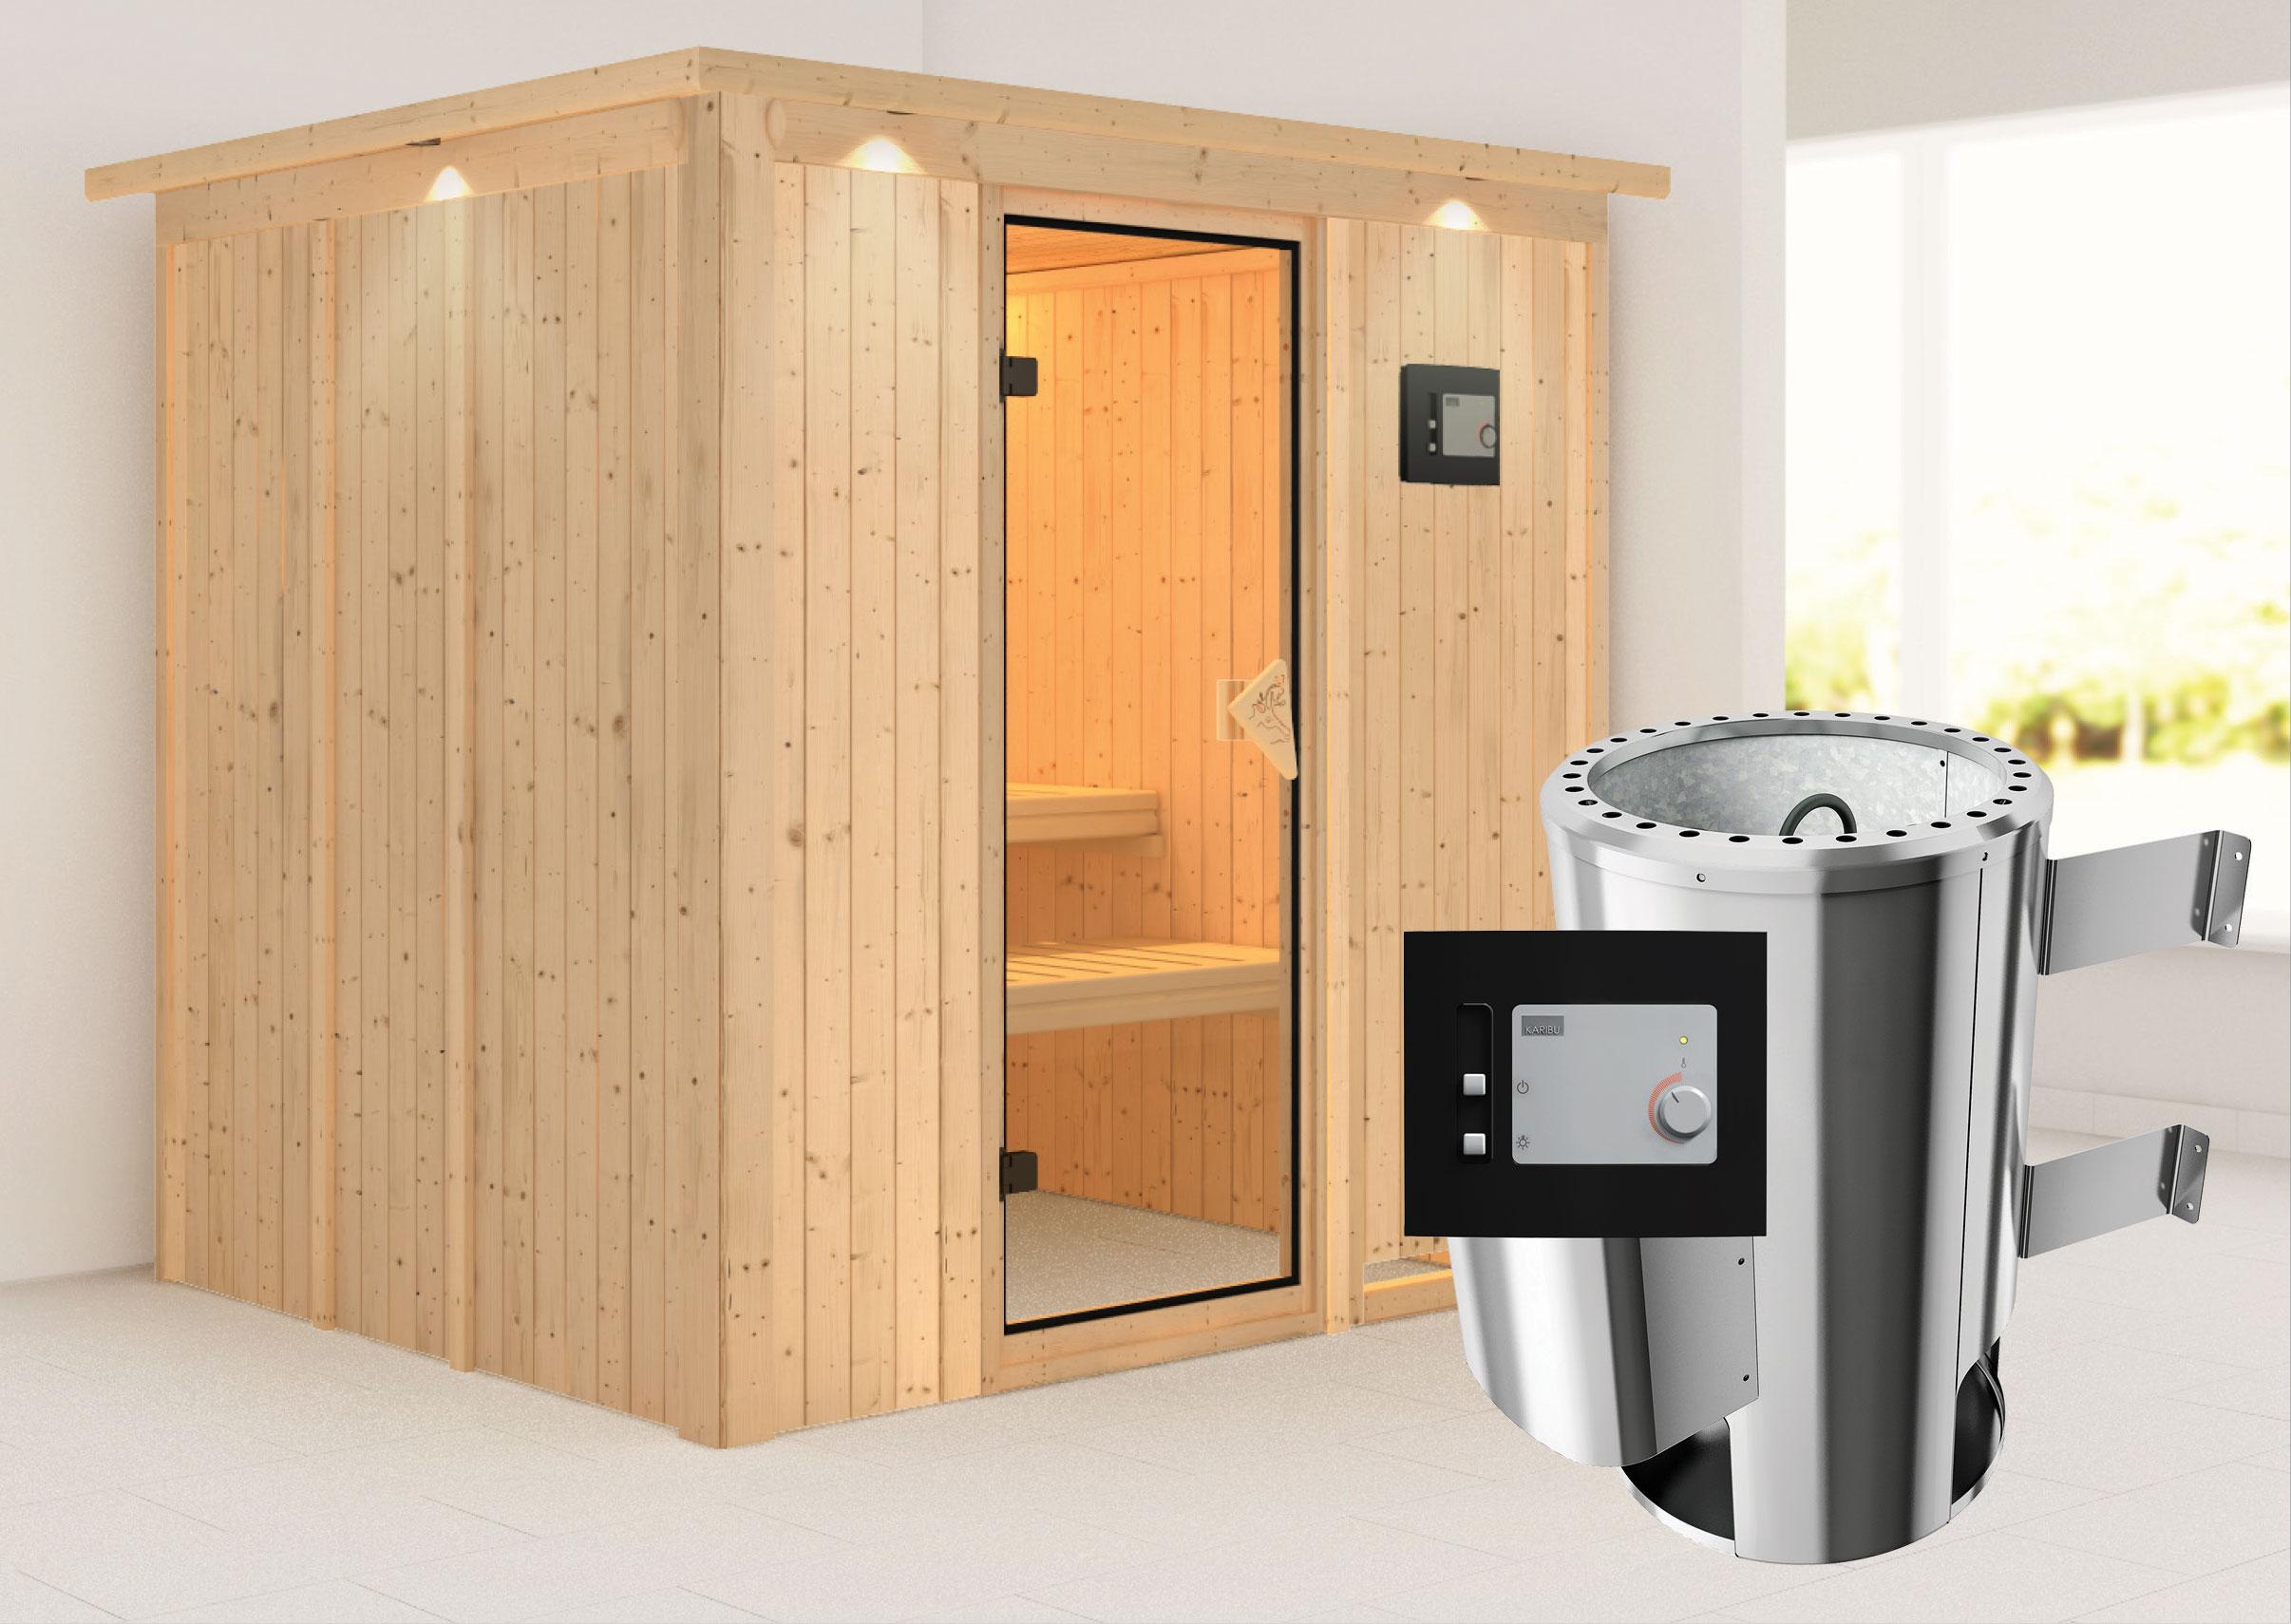 karibu sauna daria 68mm 230v dachkranz ofen 3 6kw extern classic t r bei. Black Bedroom Furniture Sets. Home Design Ideas